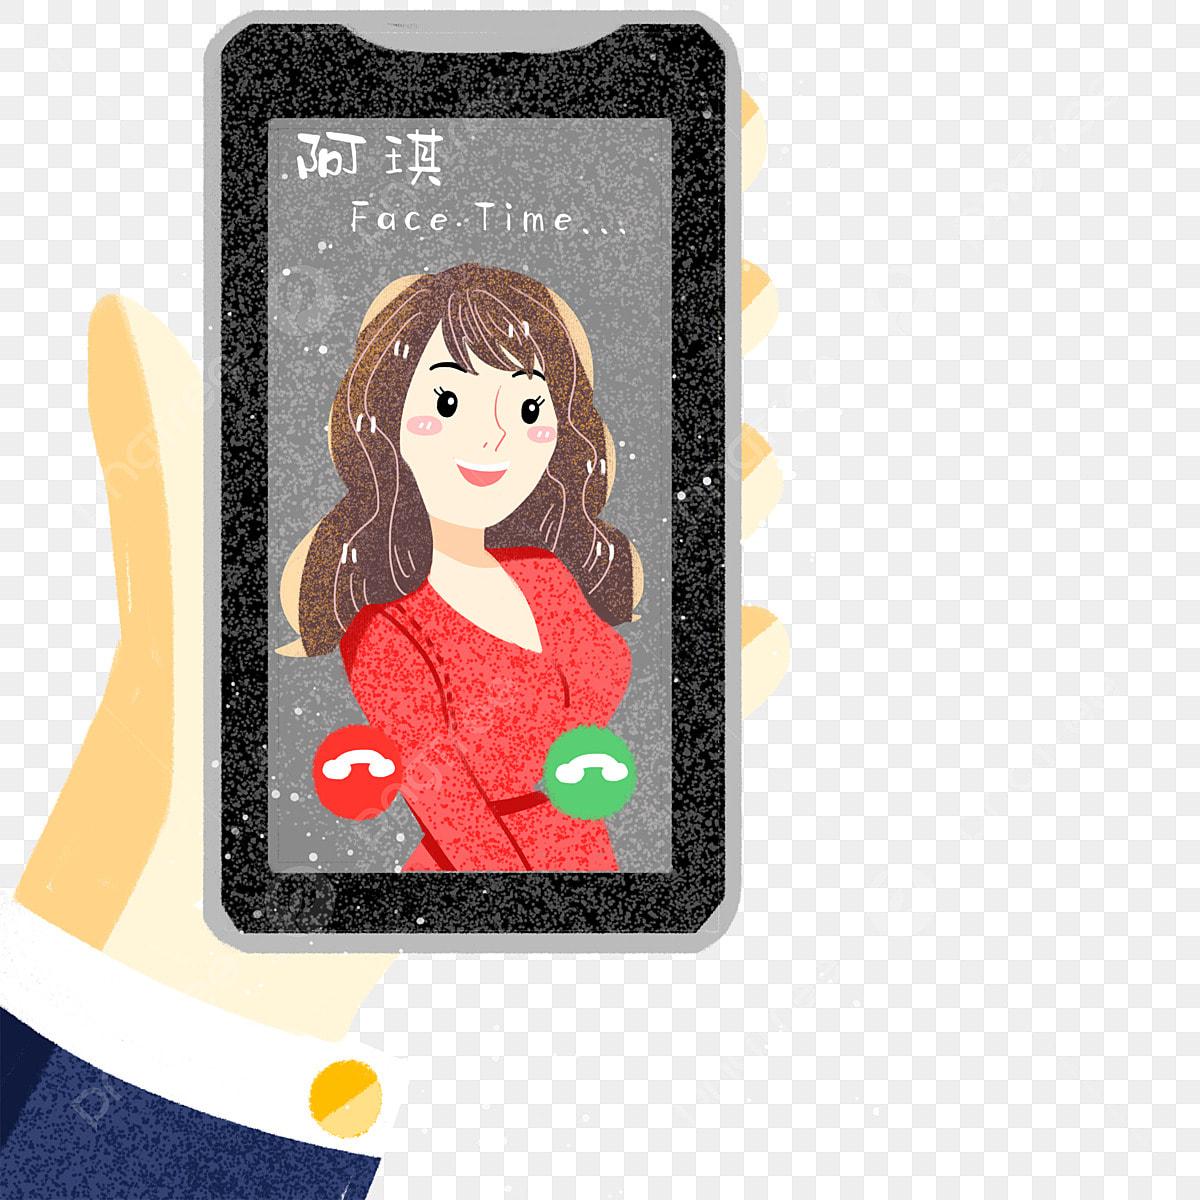 Man Video Chatting On Mobile Phone Vector Cartoon Clipart - FriendlyStock